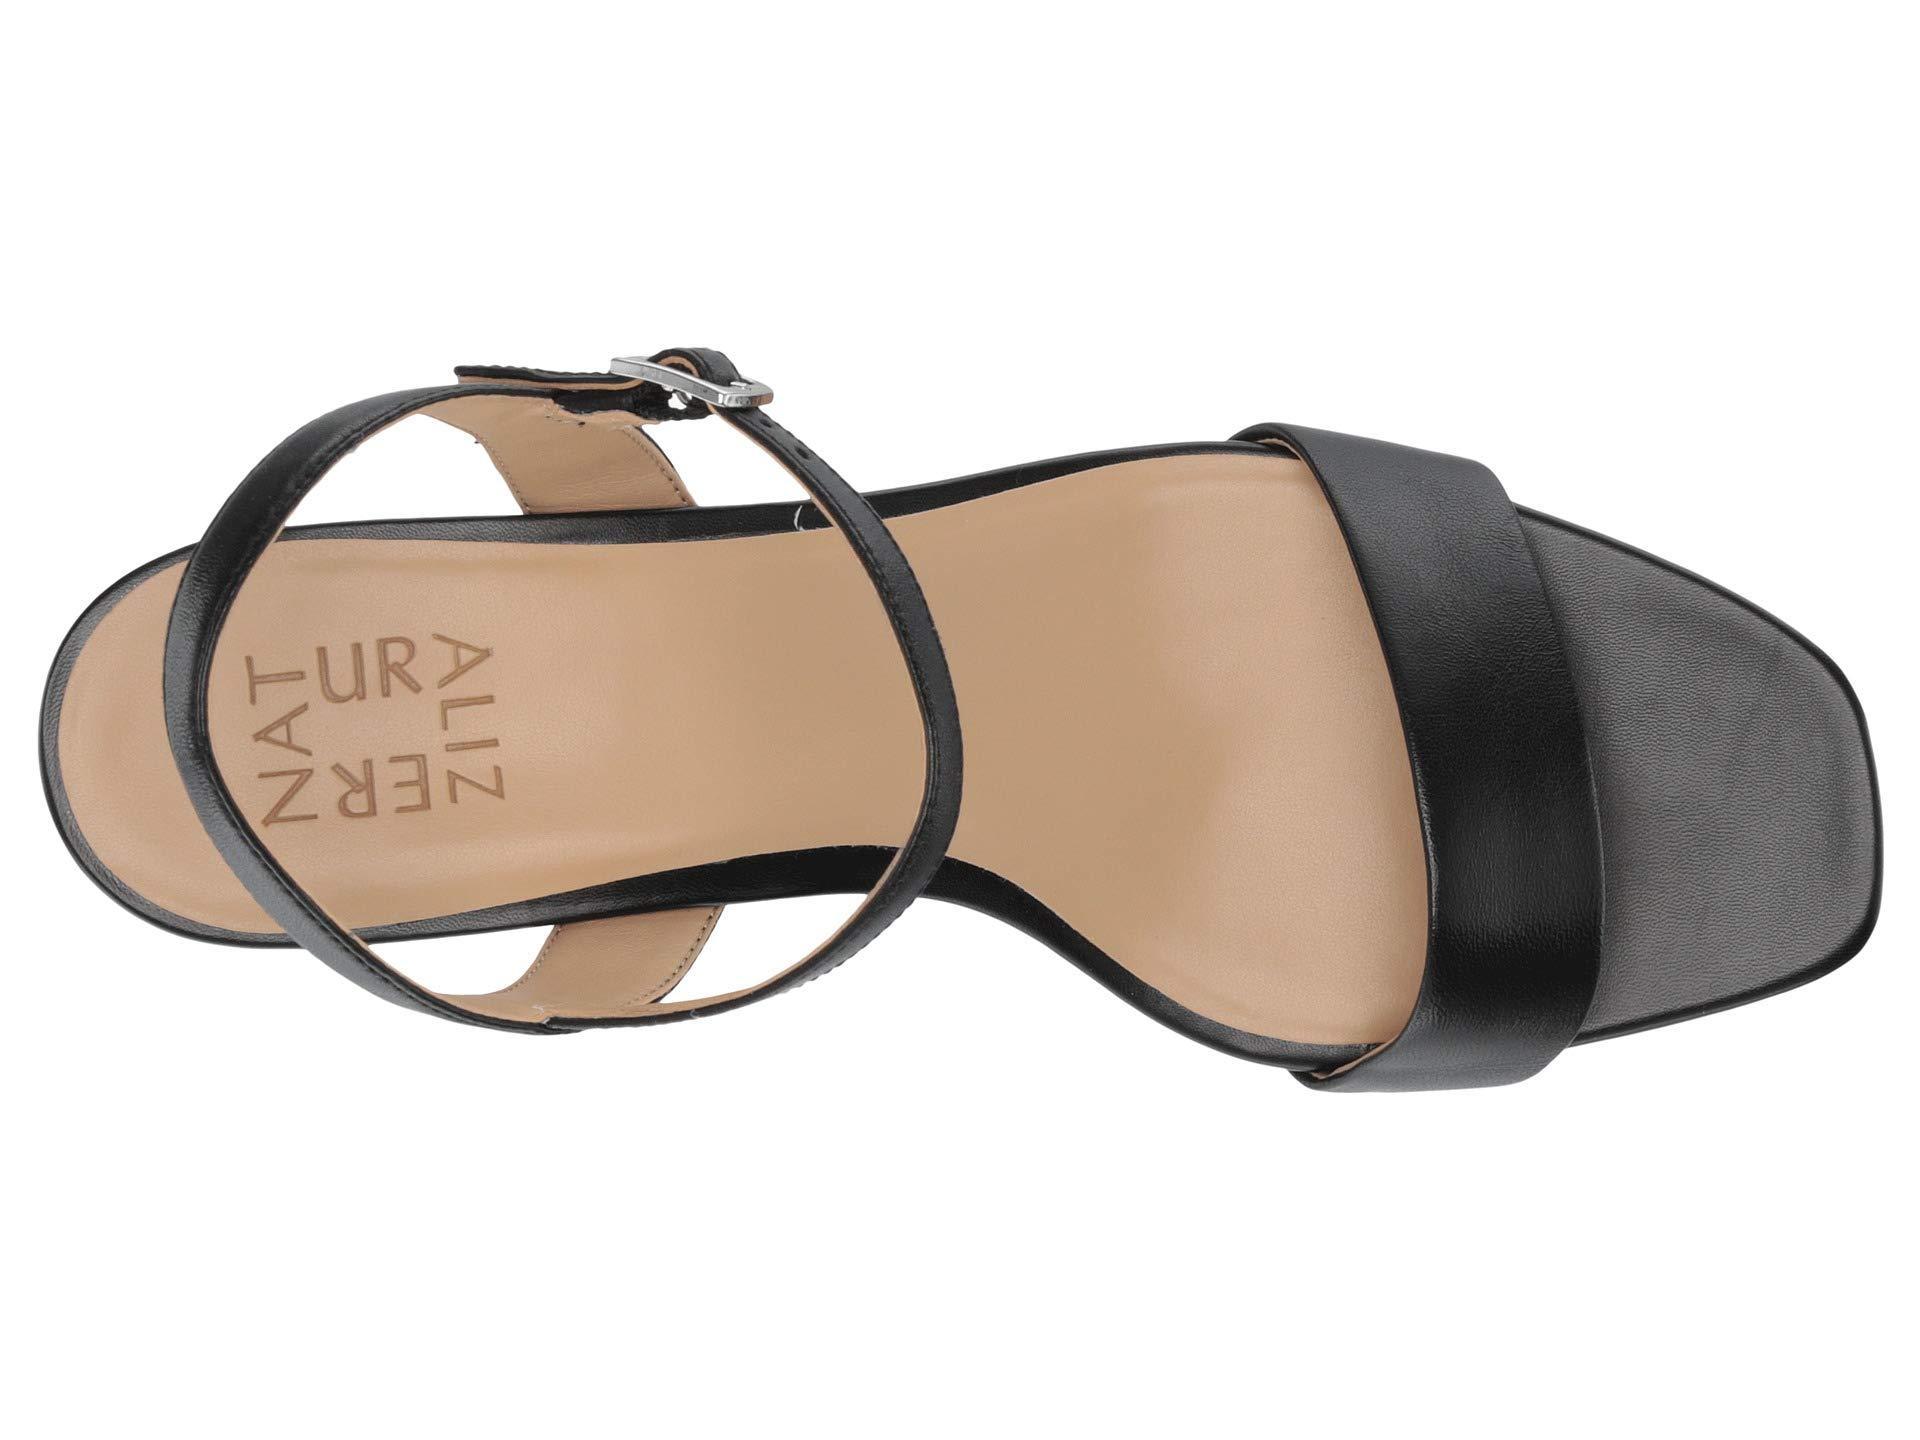 c1338b3b771 Naturalizer - Ivy (black Leather) High Heels - Lyst. View fullscreen